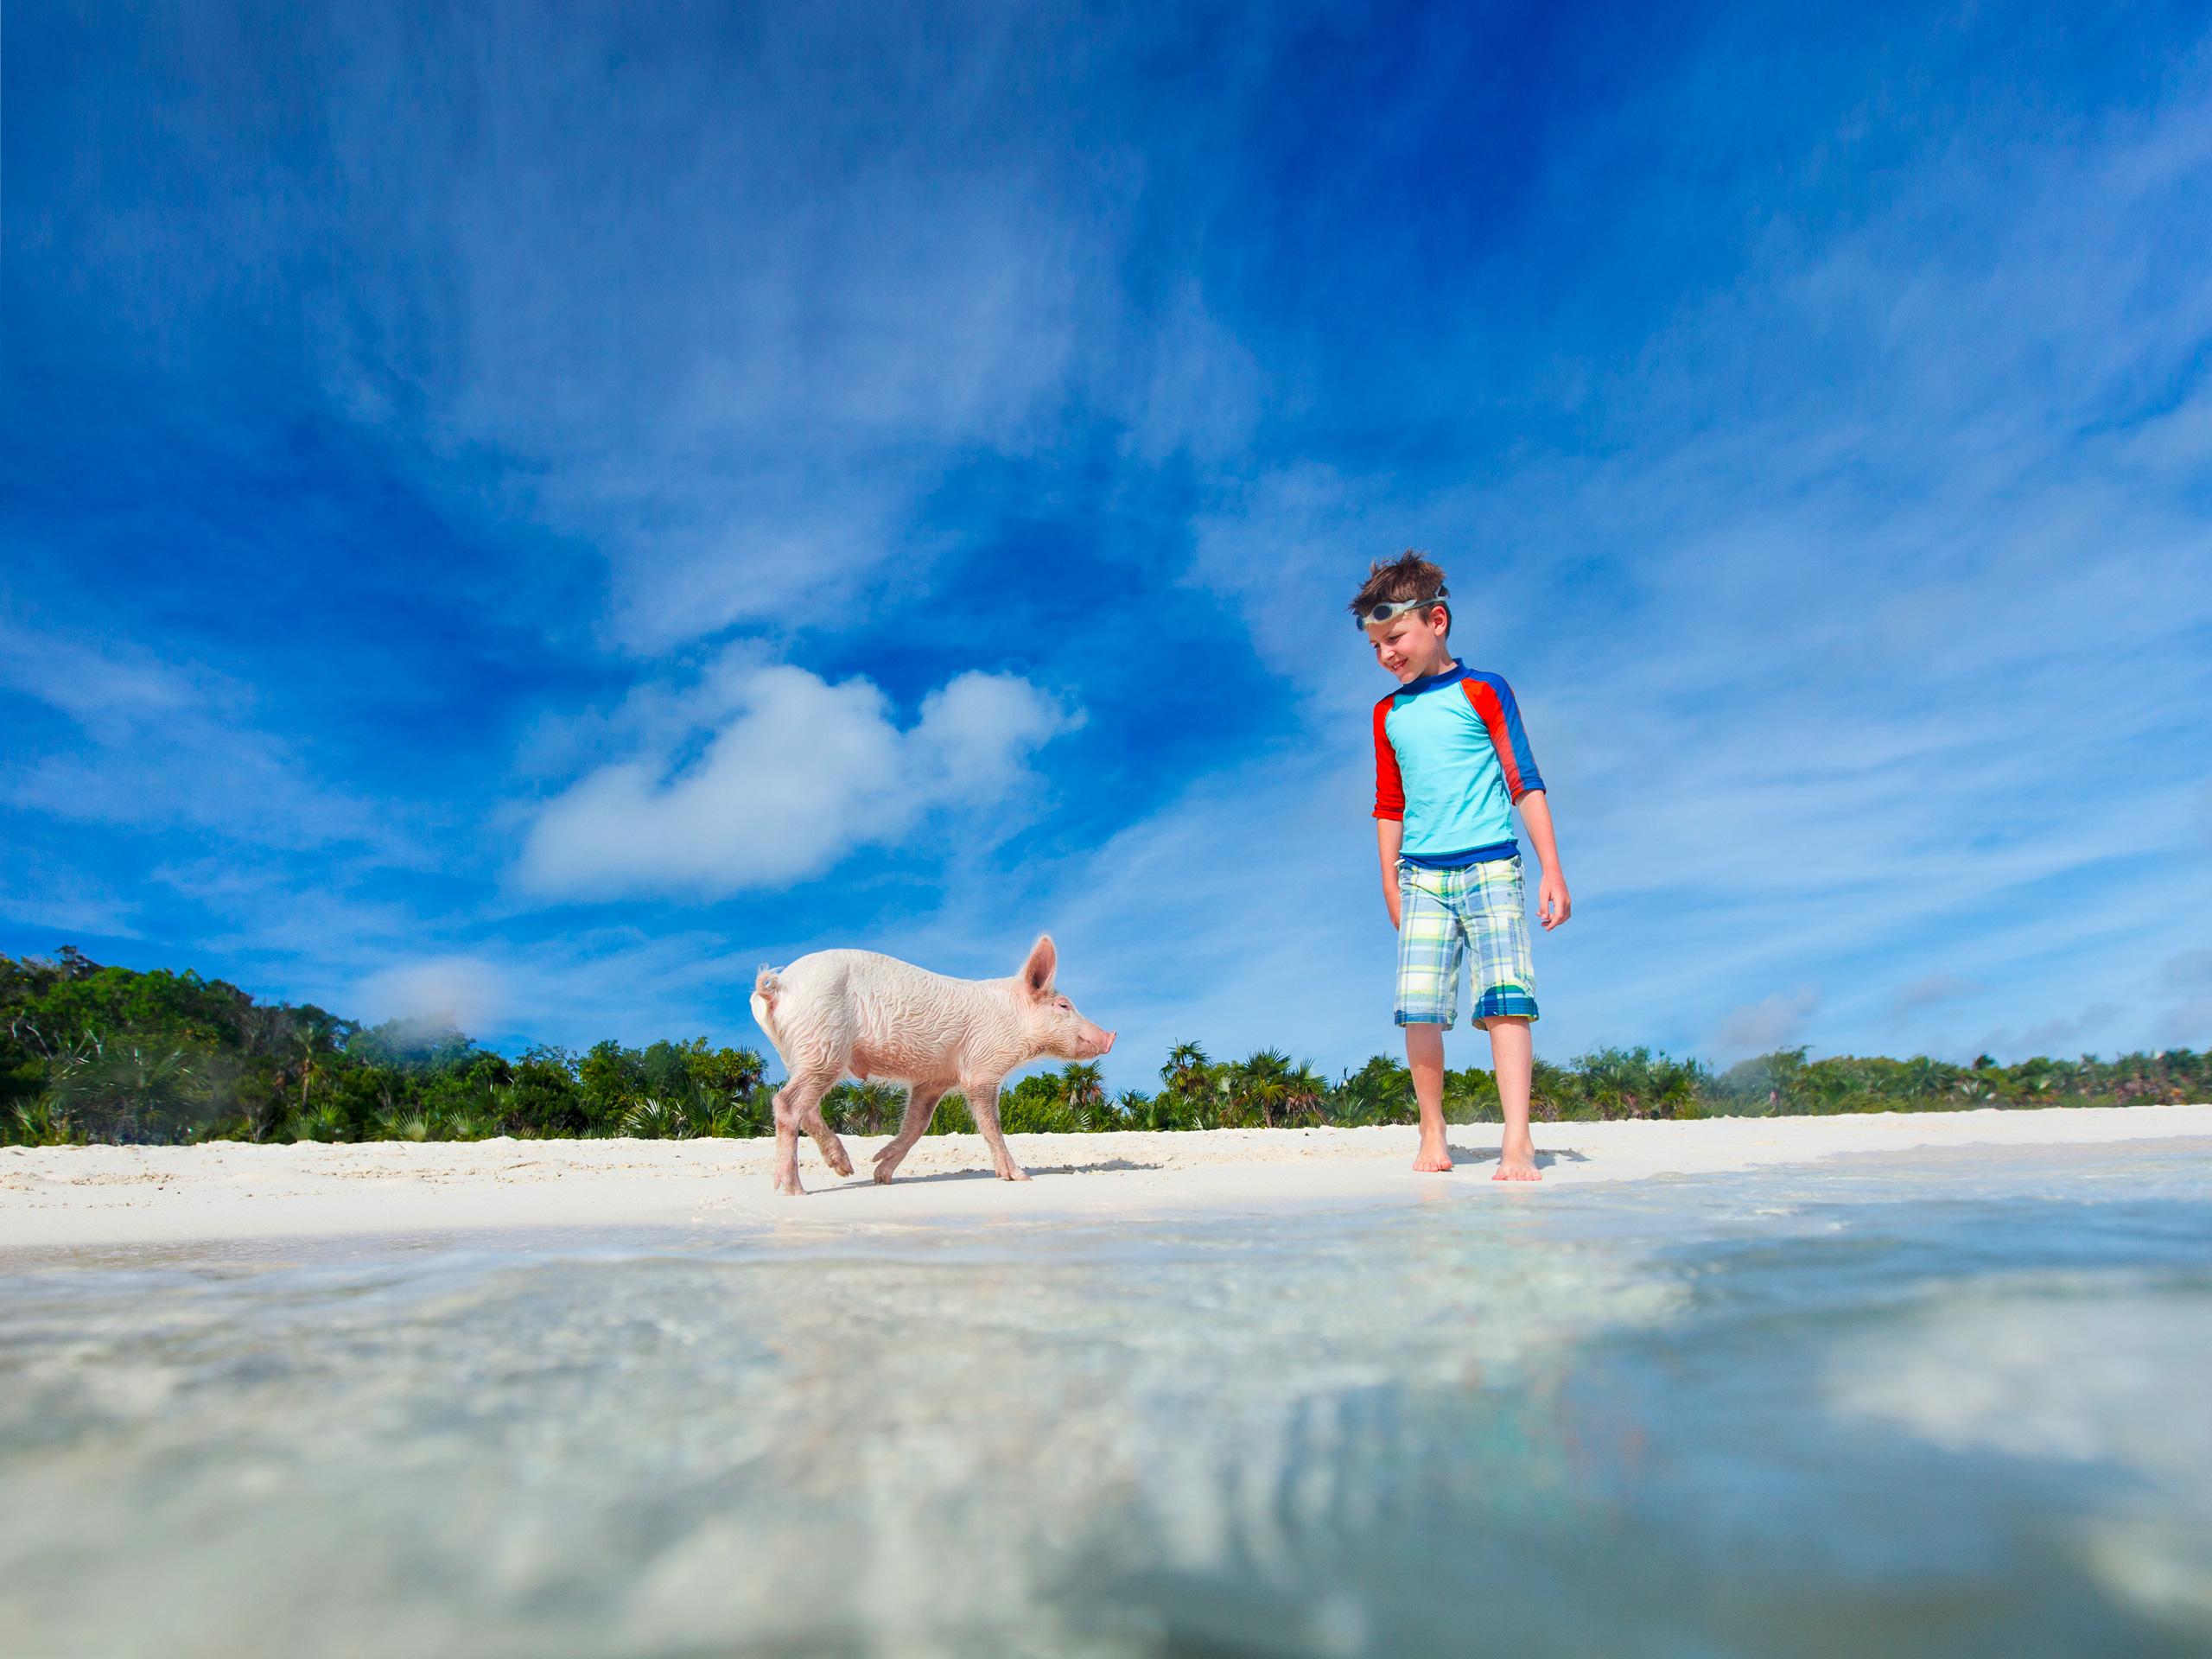 Boy with little piglet at Exuma beach, Bahamas. ; Courtesy of BlueOrange Studio/Shutterstock